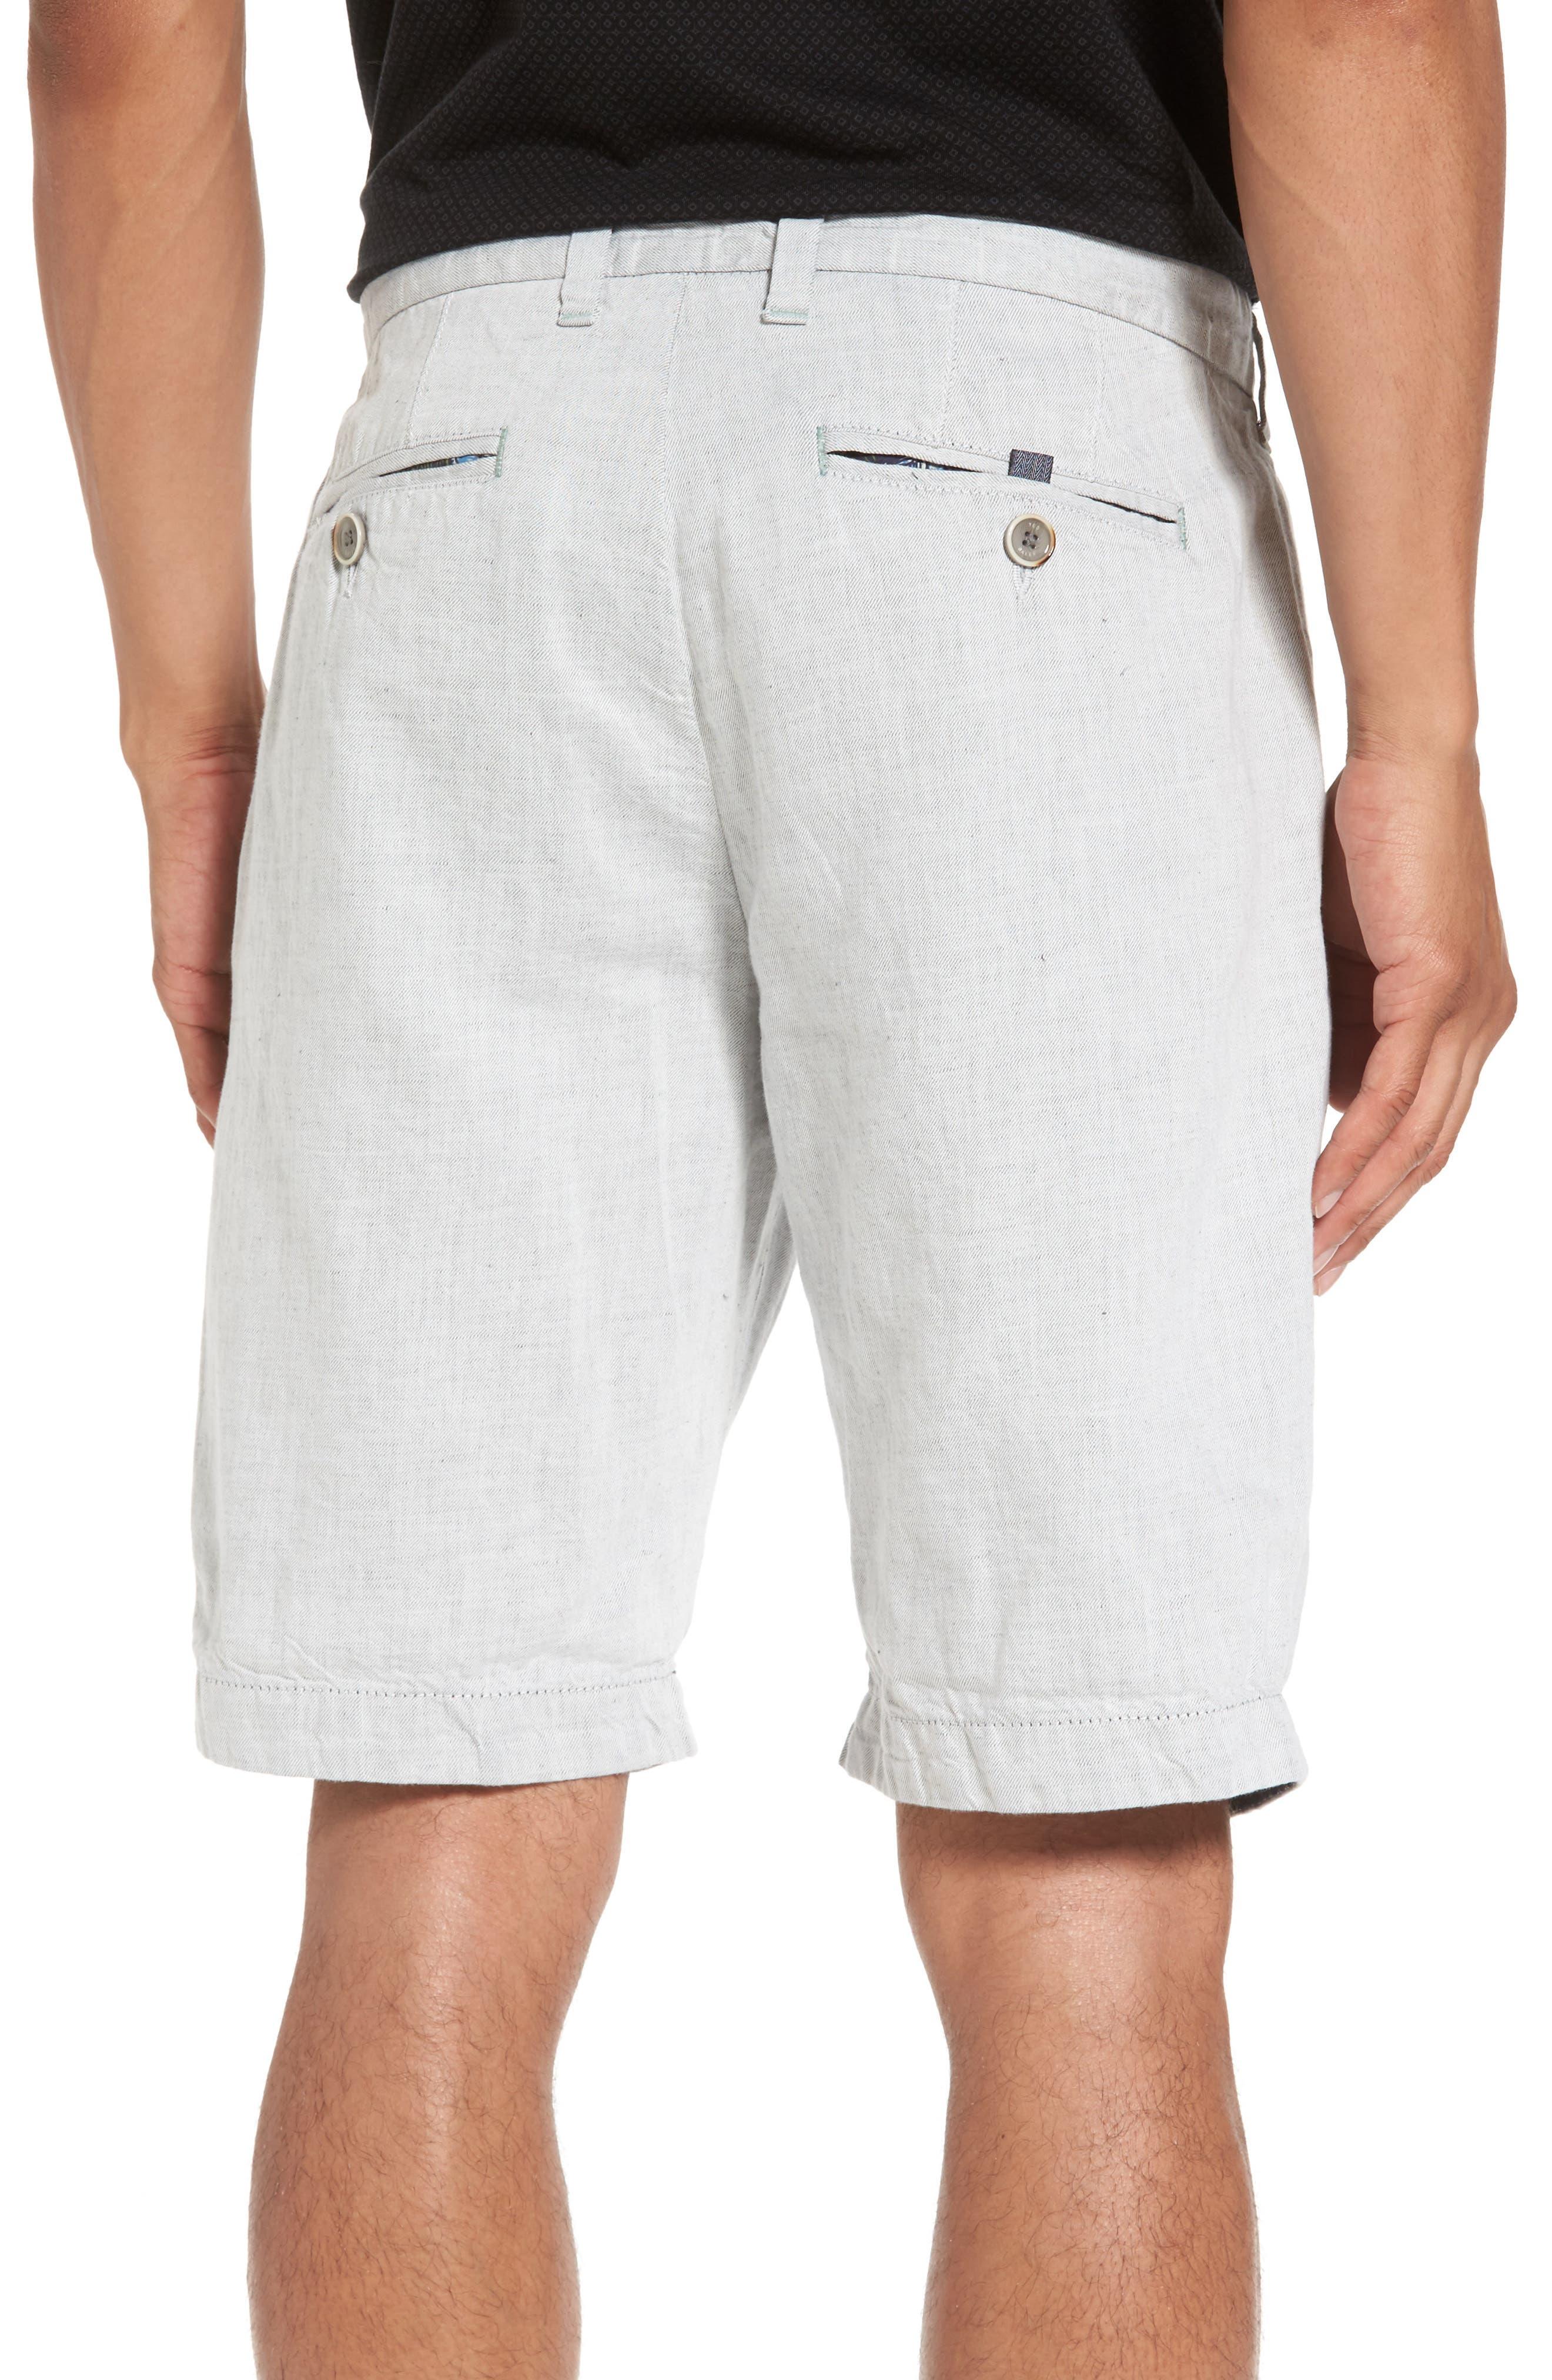 Frisho Cuff Denim Shorts,                             Alternate thumbnail 2, color,                             Light Grey